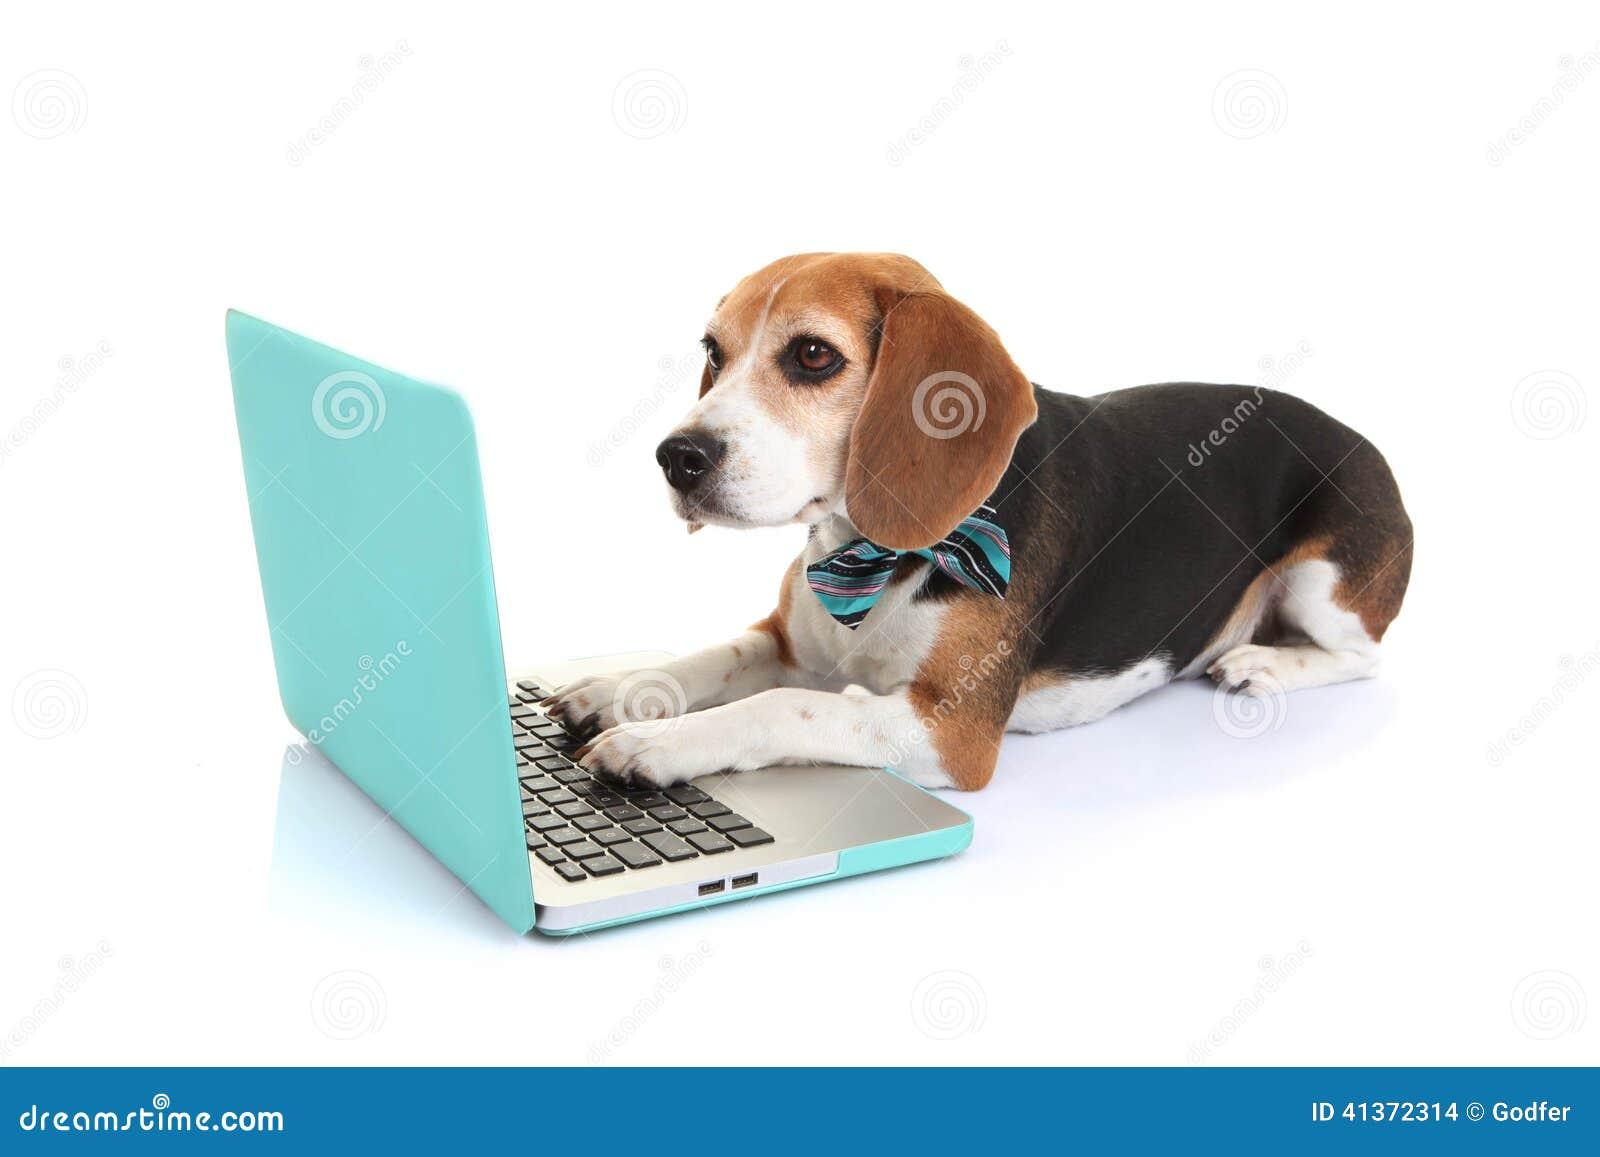 Business concept pet dog using laptop computer